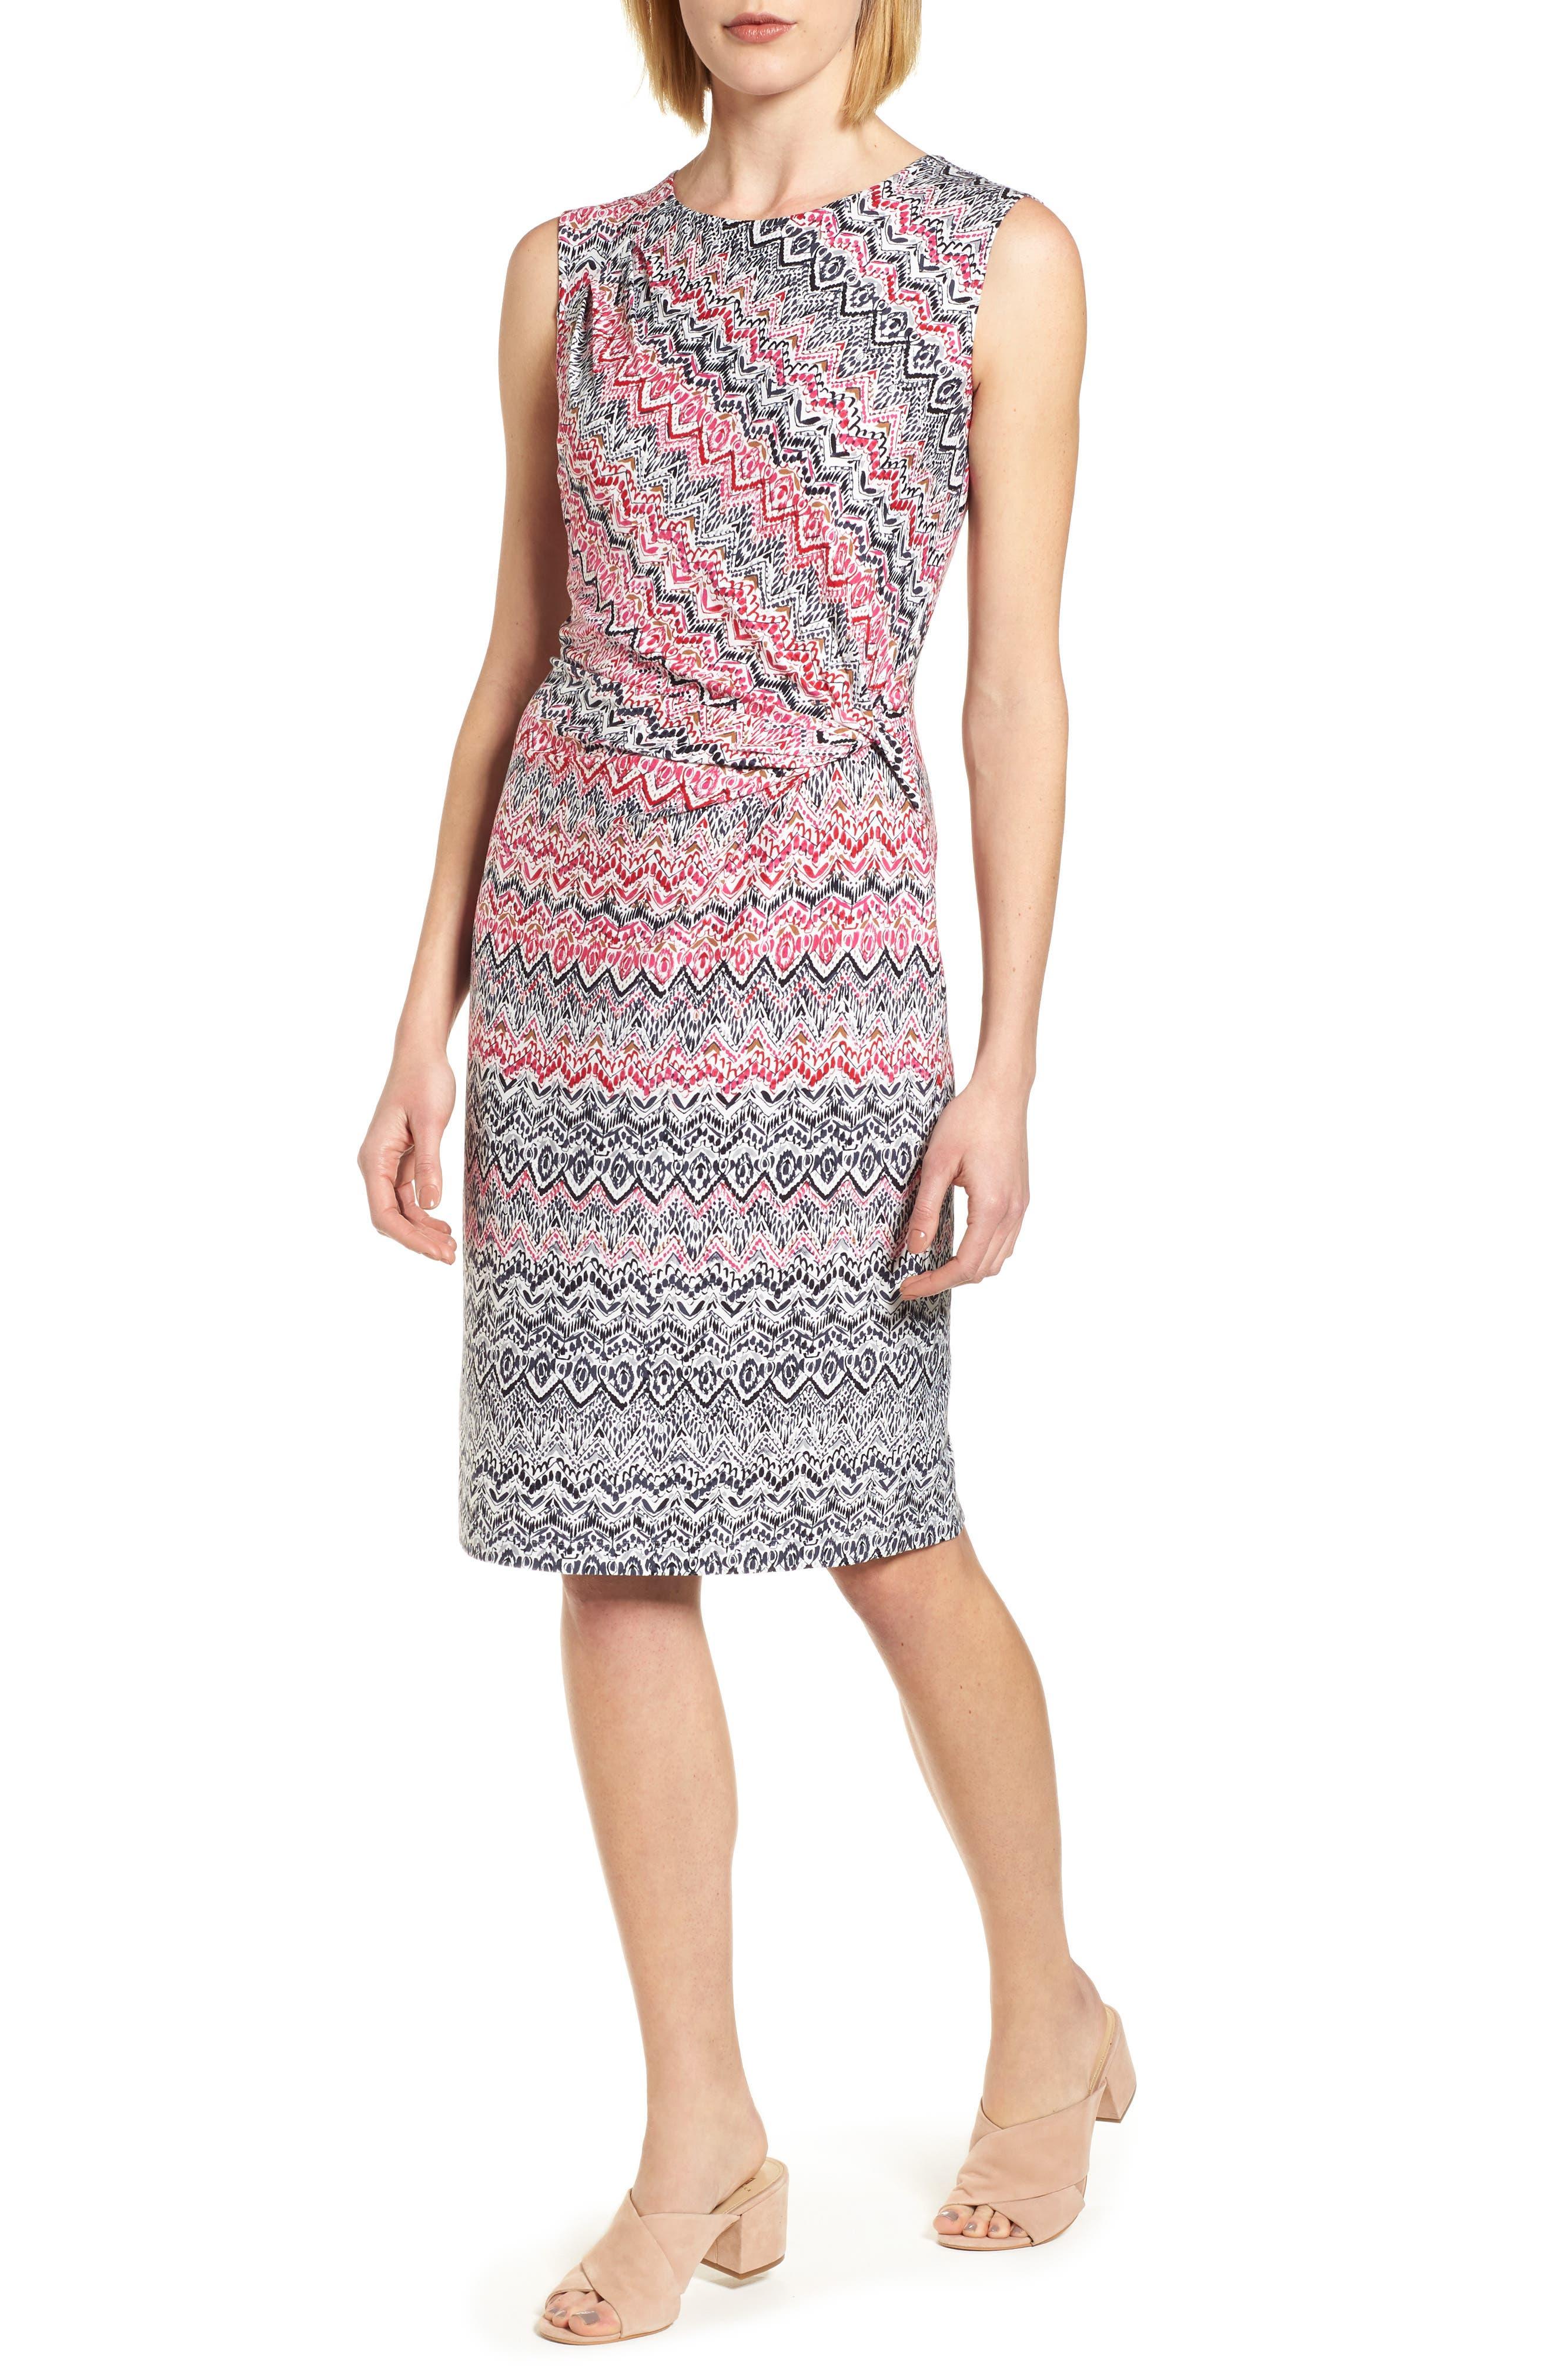 Alternate Image 1 Selected - NIC+ZOE Spiced Up Twist Sheath Dress (Regular & Petite)